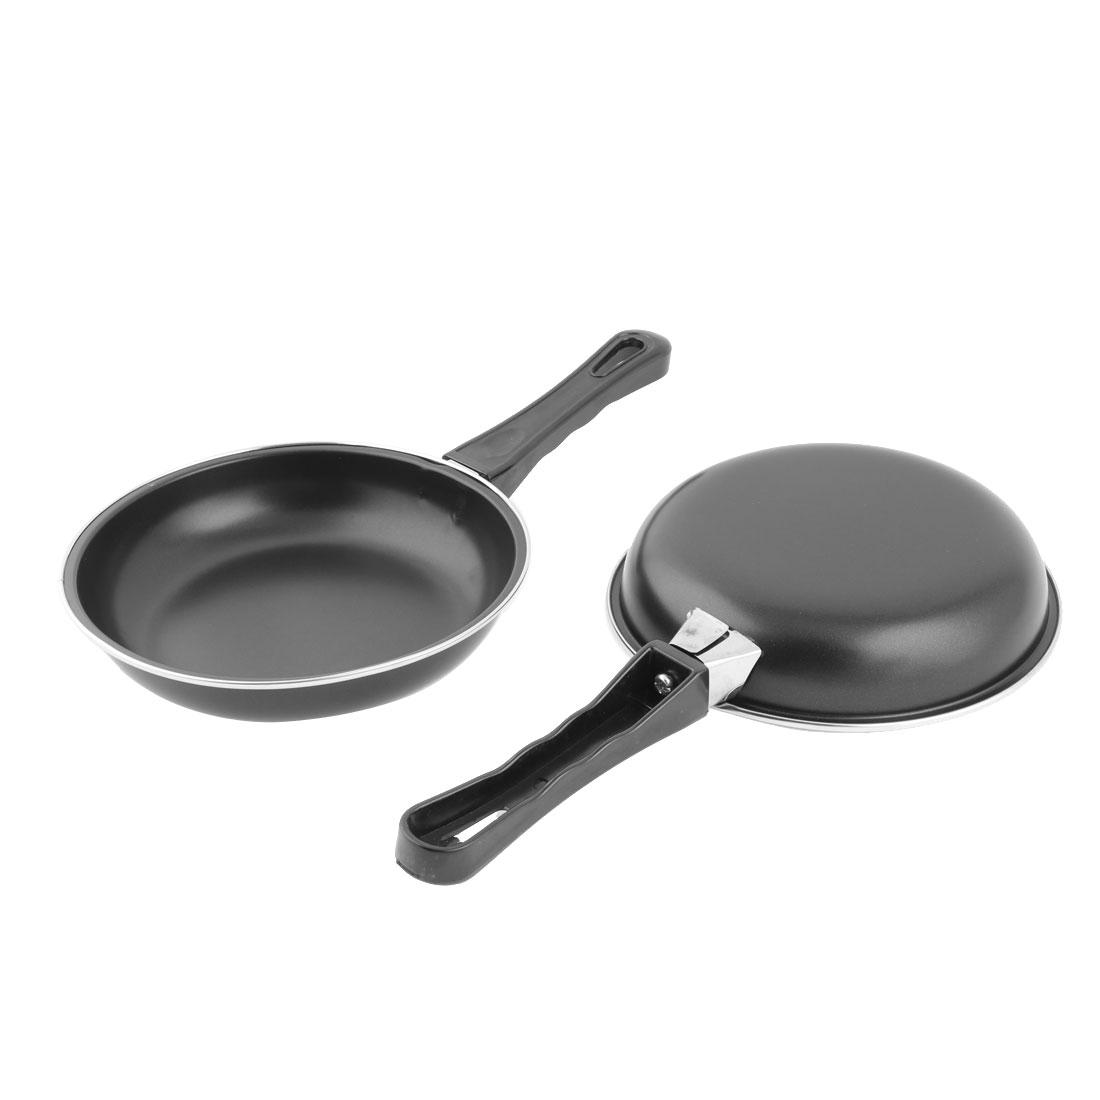 Household Kitchen Aluminium Alloy Cookware Egg Pancake Frying Pan 14 Inches Length